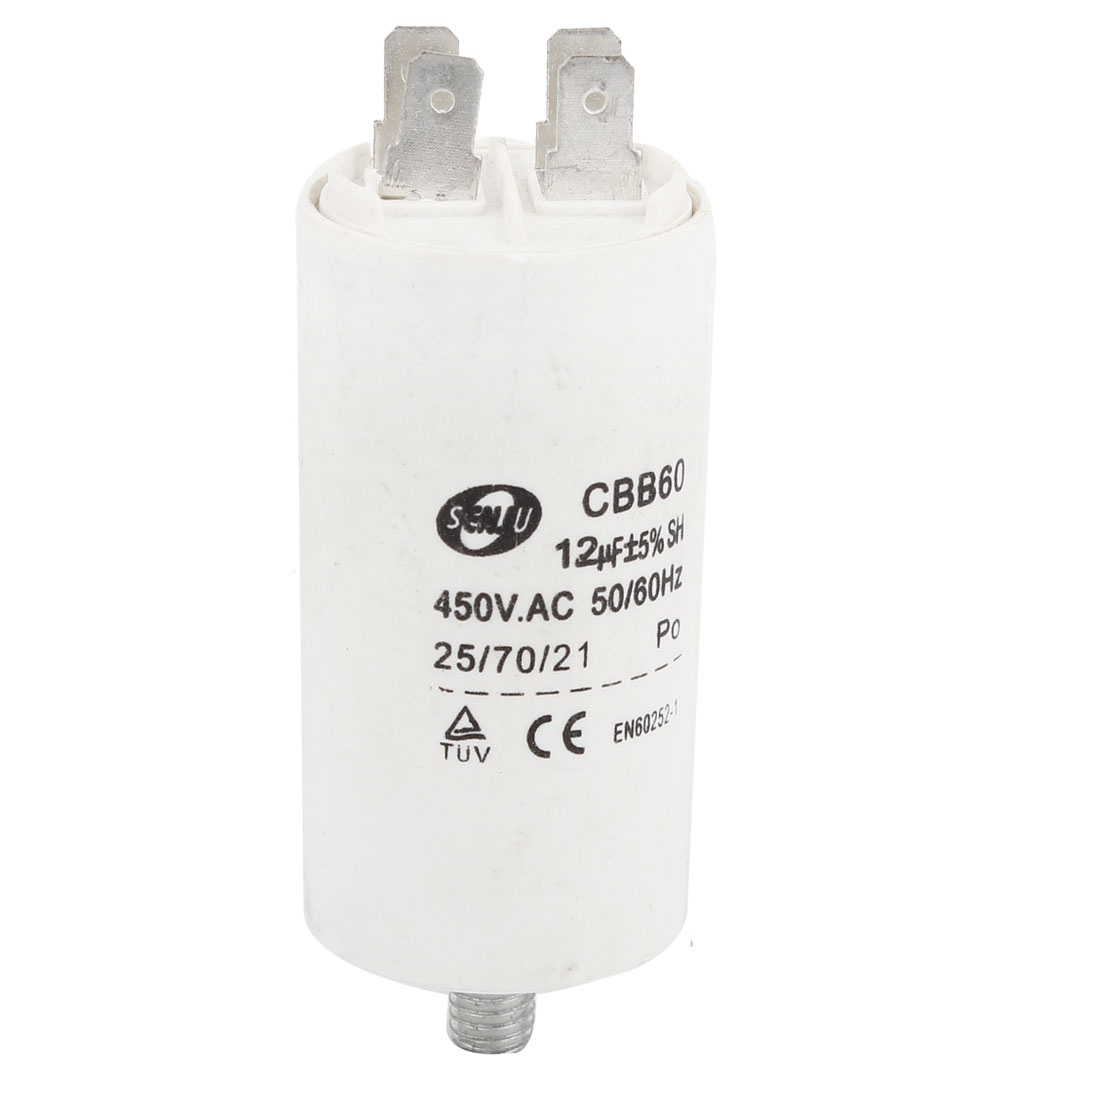 Washing Machine CBB60 12uF AC 450V Non Polar Motor Run Capacitor White